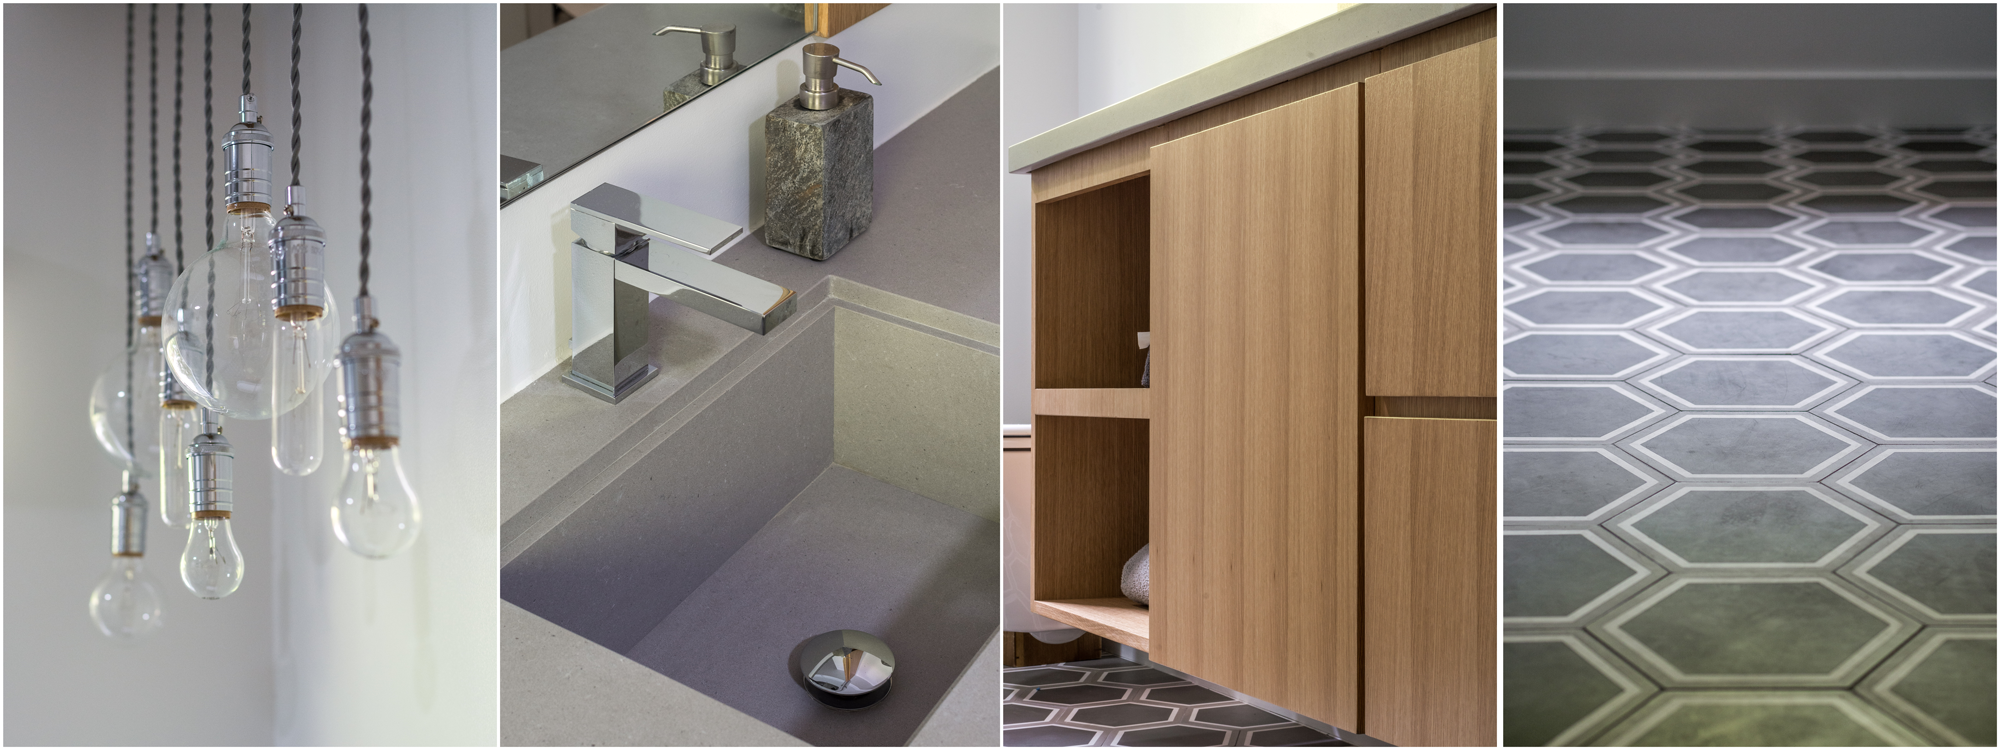 interior-design-photography-bentwood-bathroom.jpg